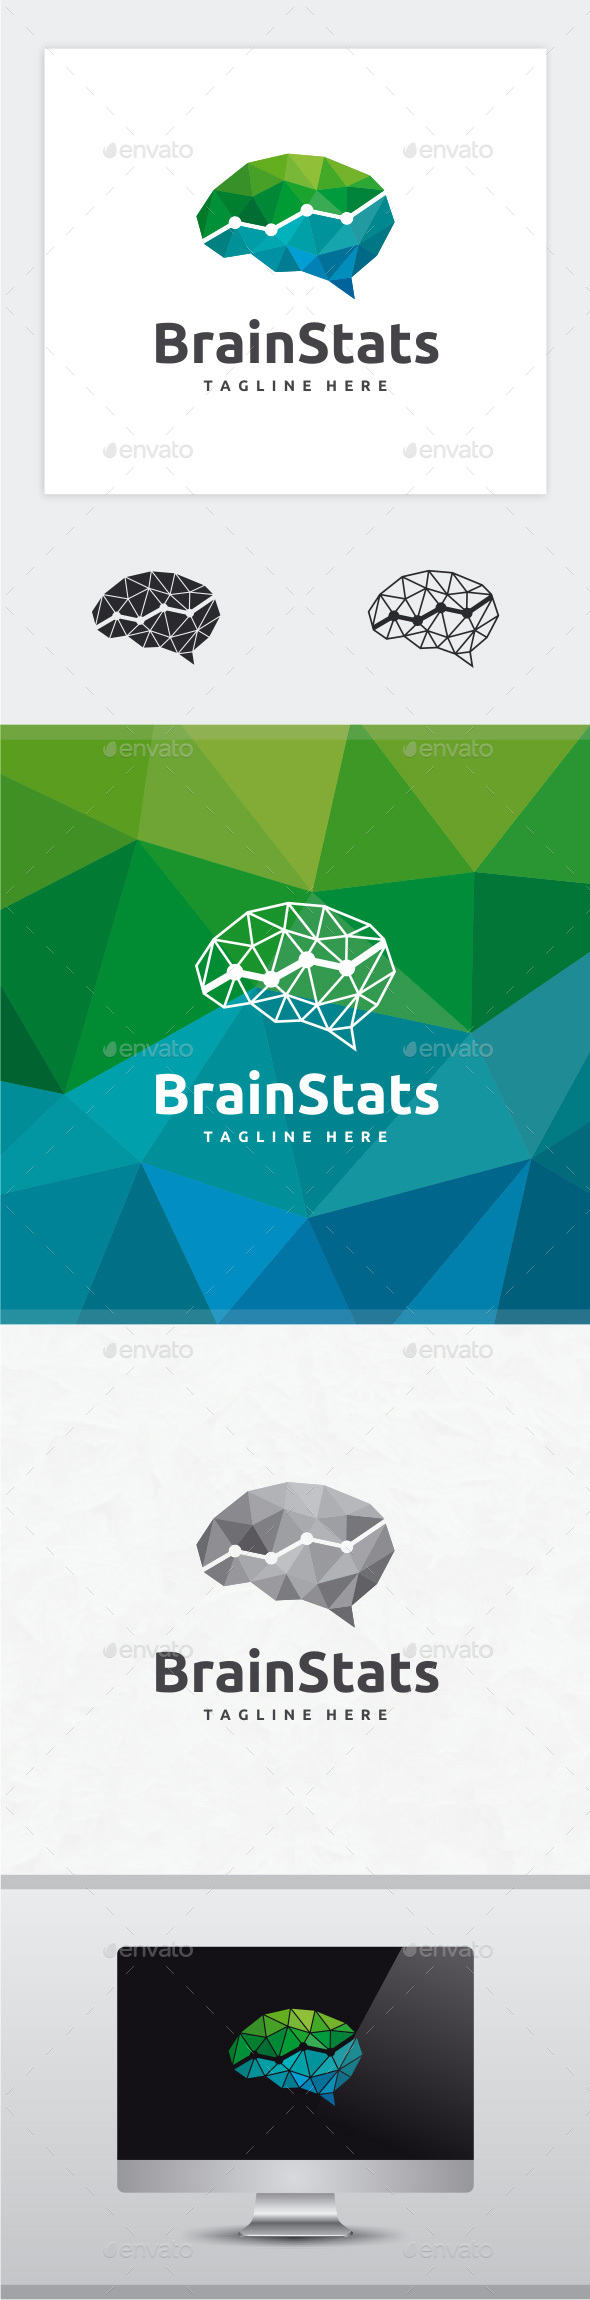 Brain Stats Logo - Vector Abstract